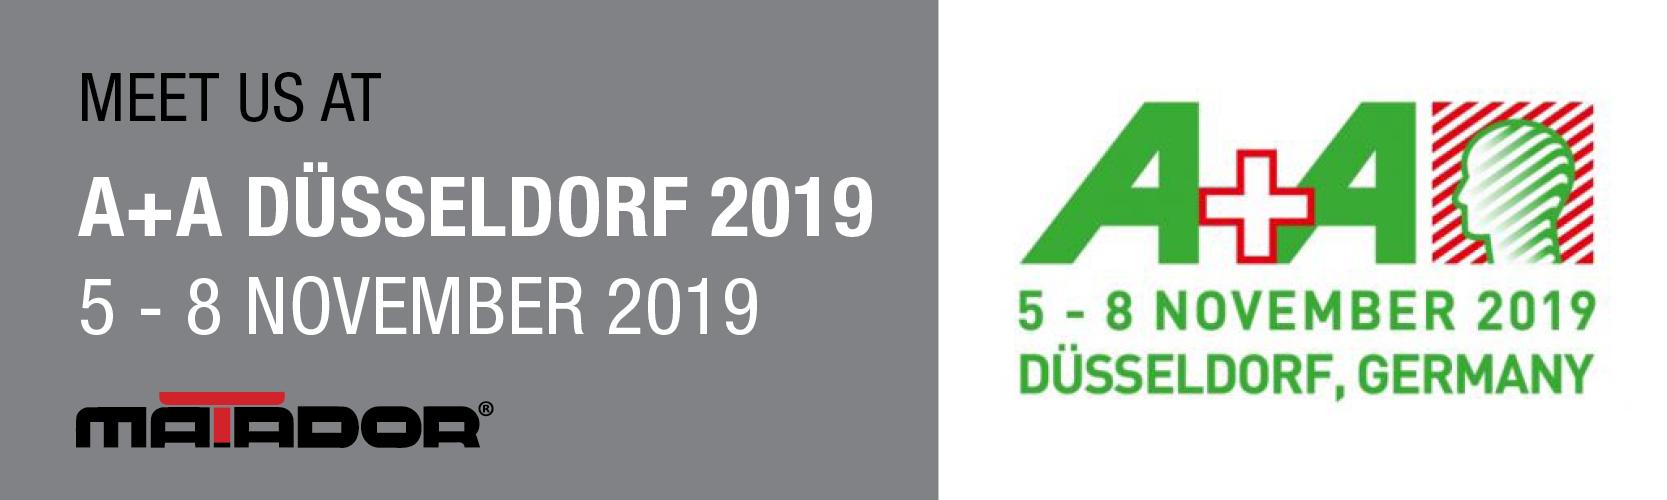 A+A-Dusseldorf-05-08-2019